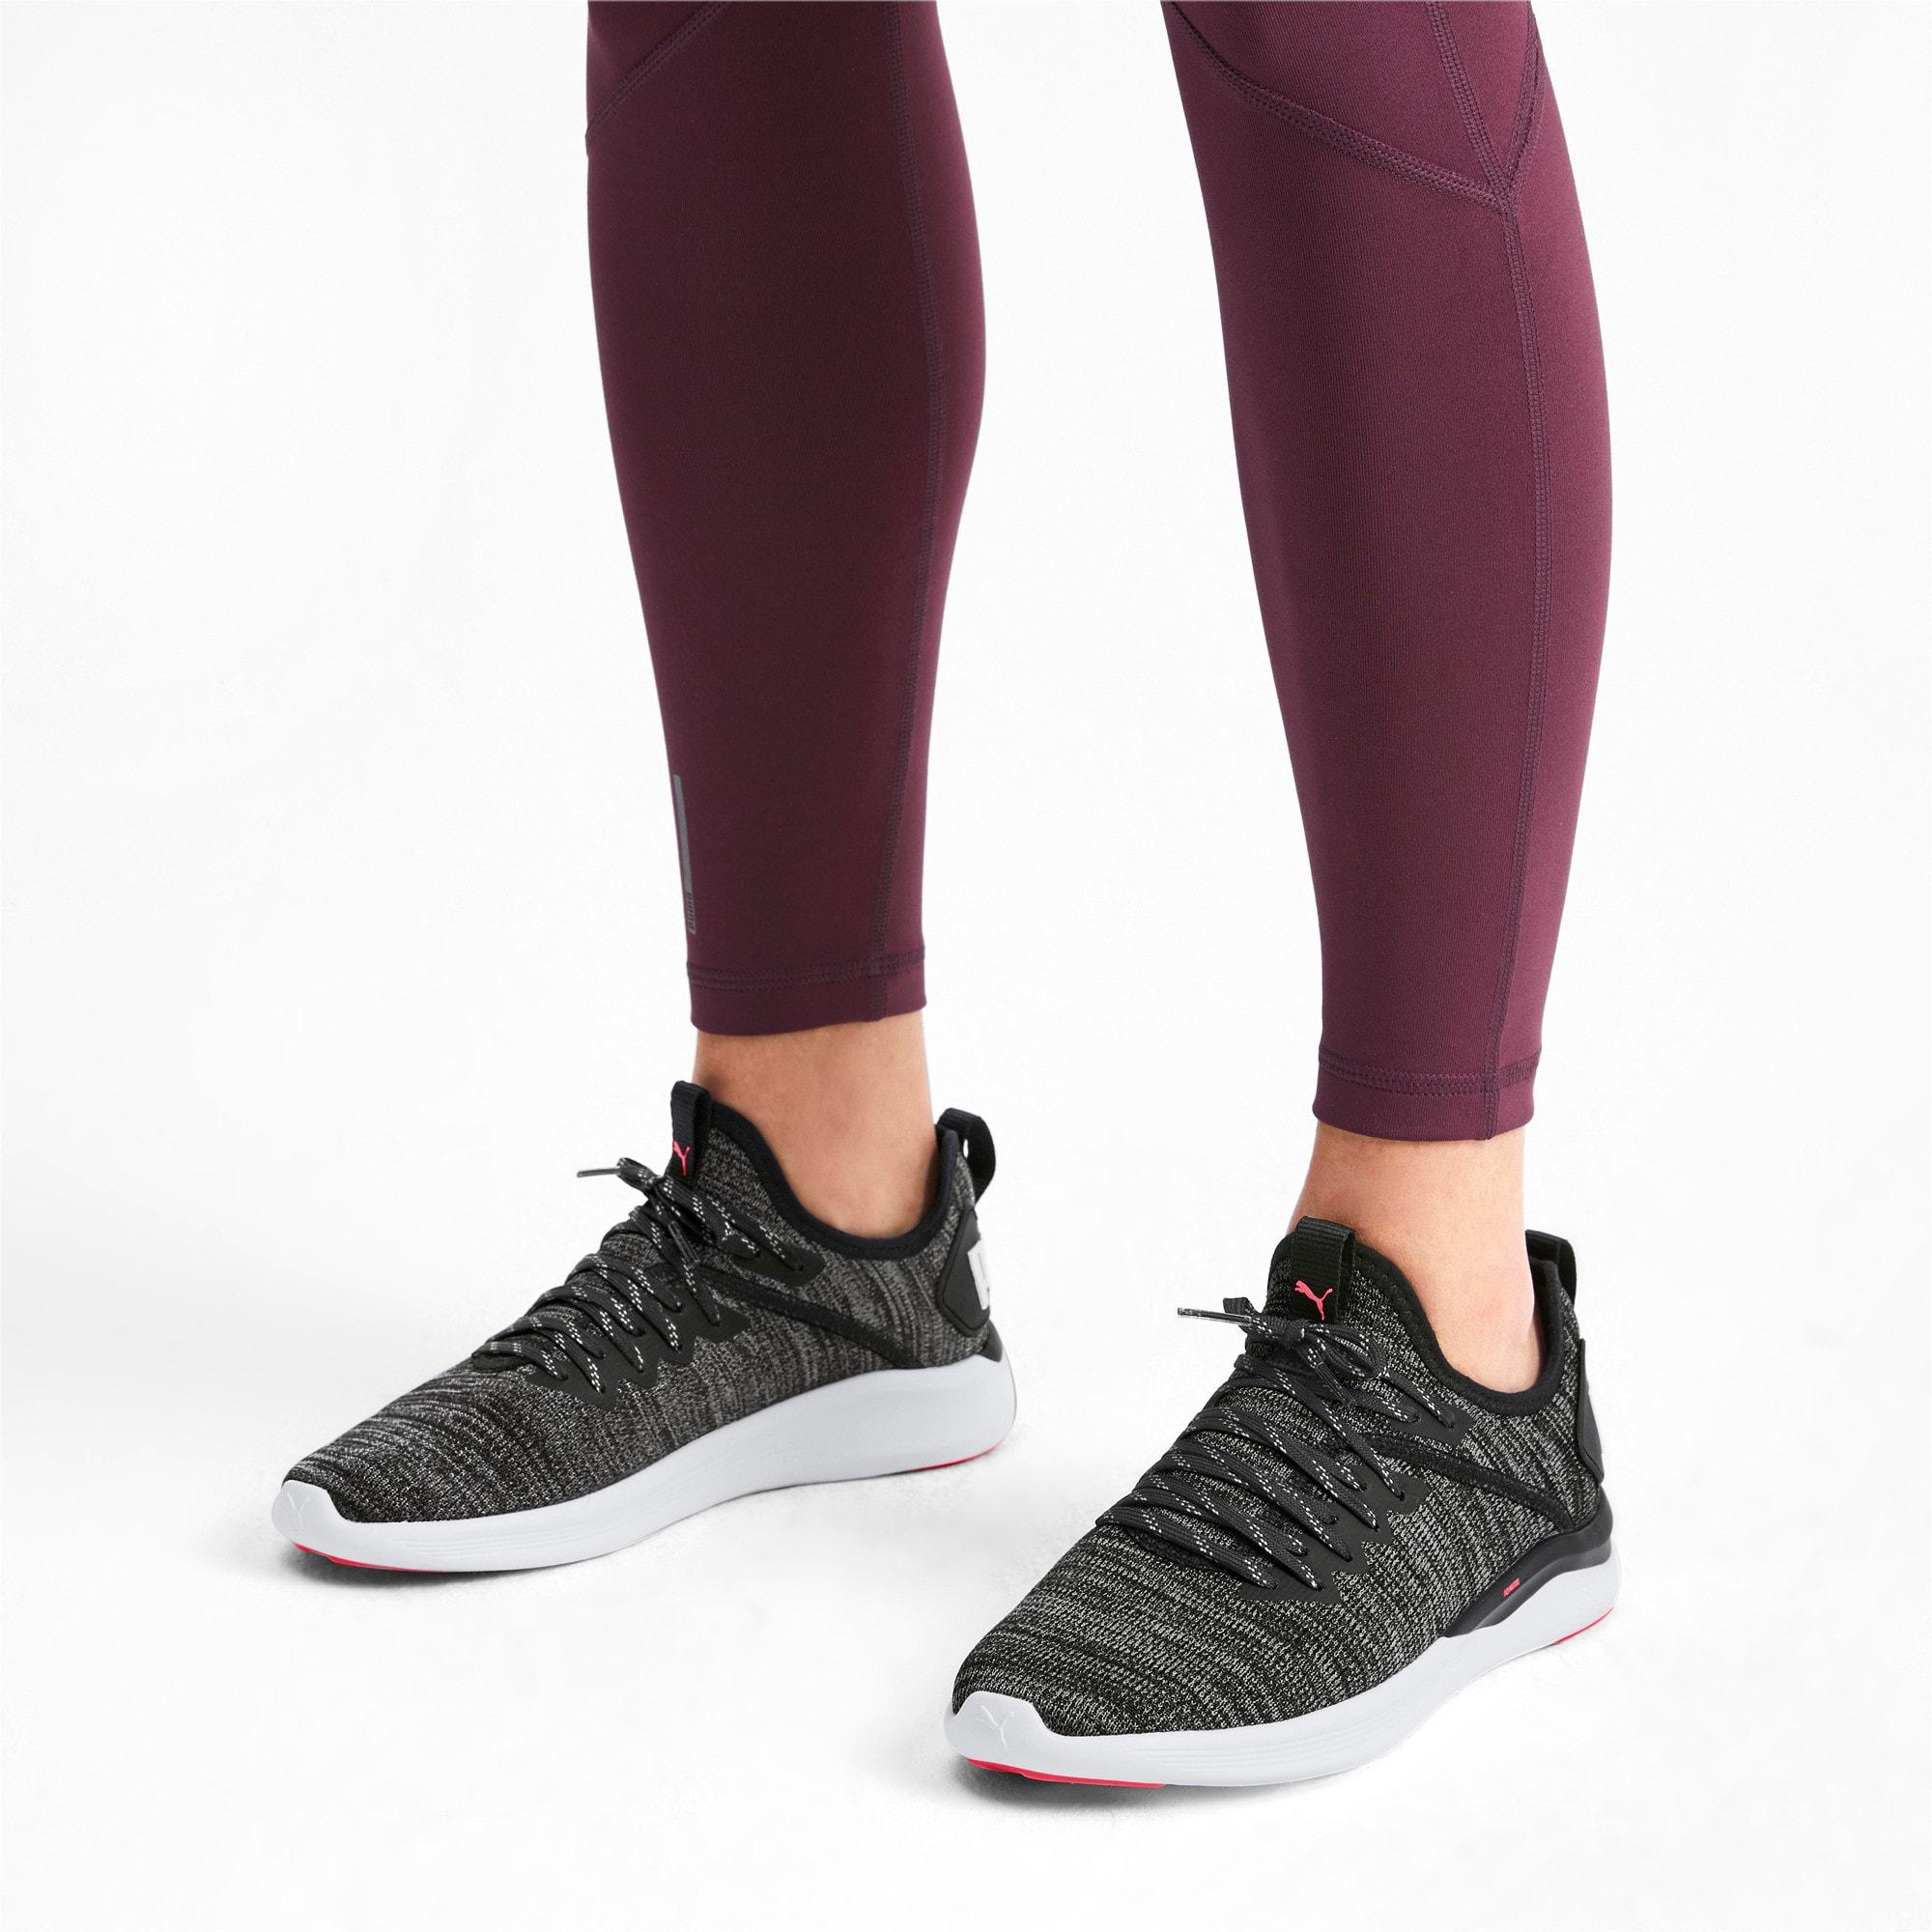 Thumbnail 2 of IGNITE Flash evoKNIT Women's Running Shoes, Black-White-Pink Alert, medium